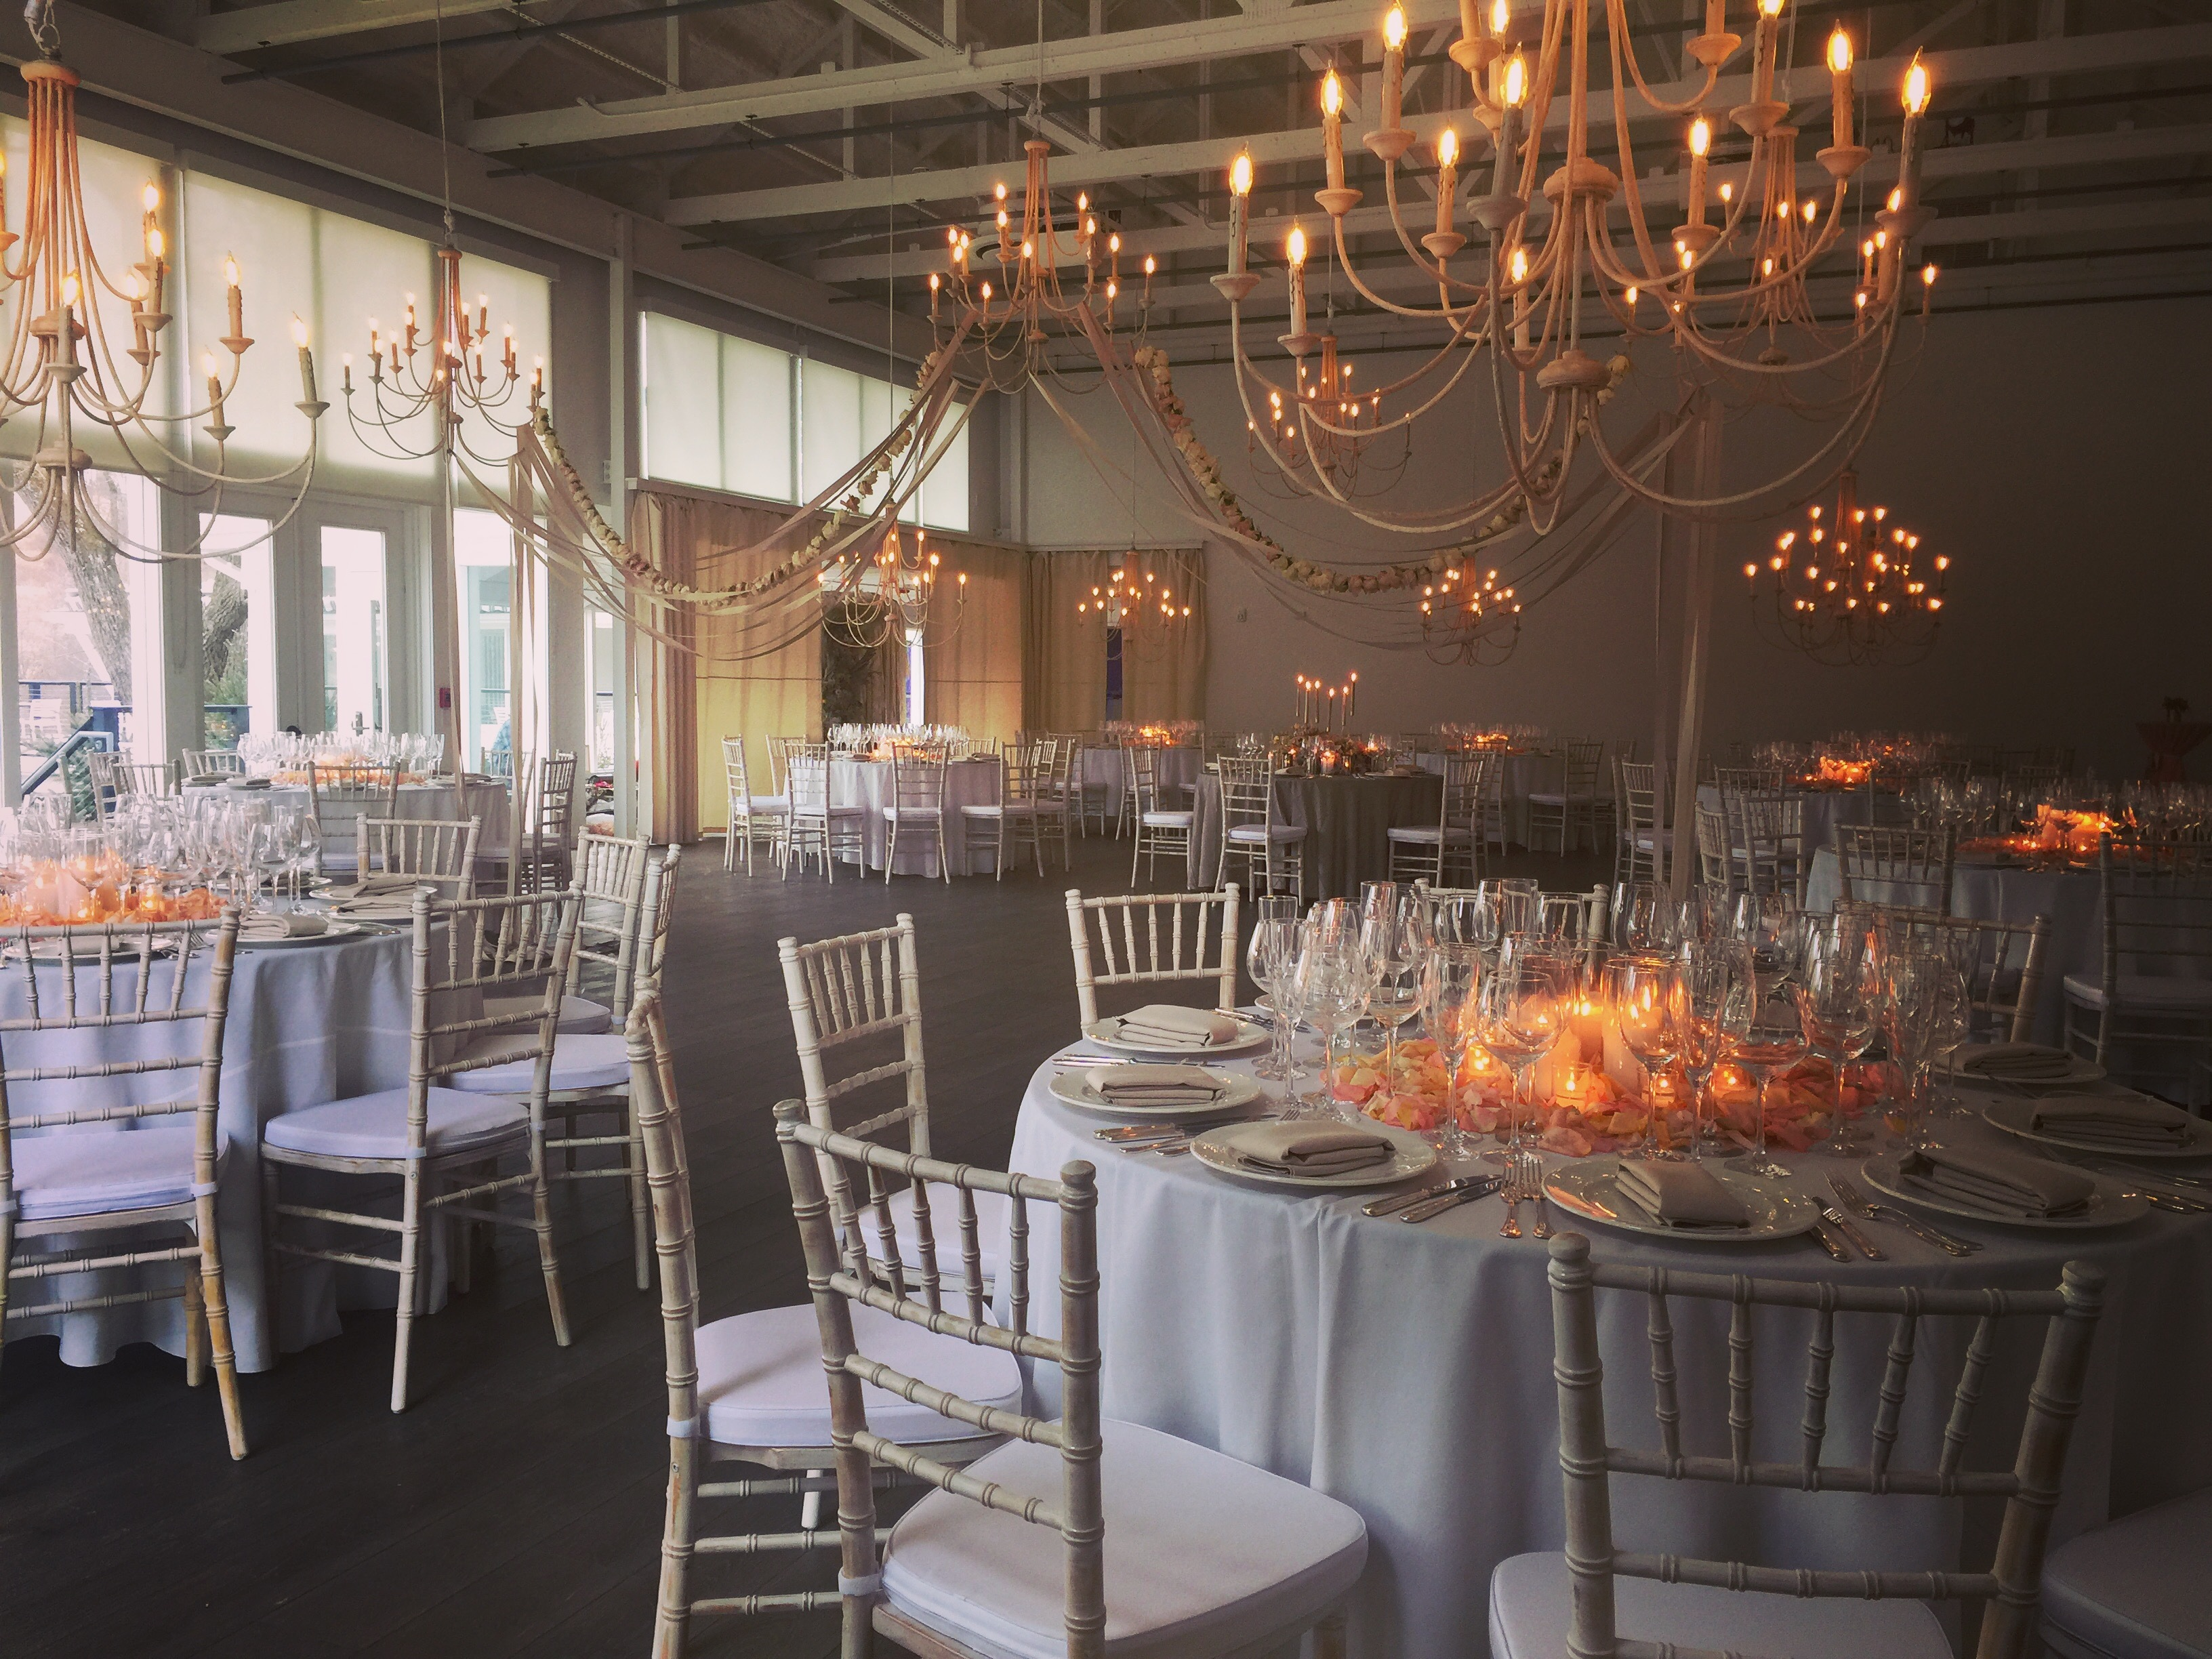 Durham Springs Weddings Bucks County Wedding Venue Kintnersville Pa